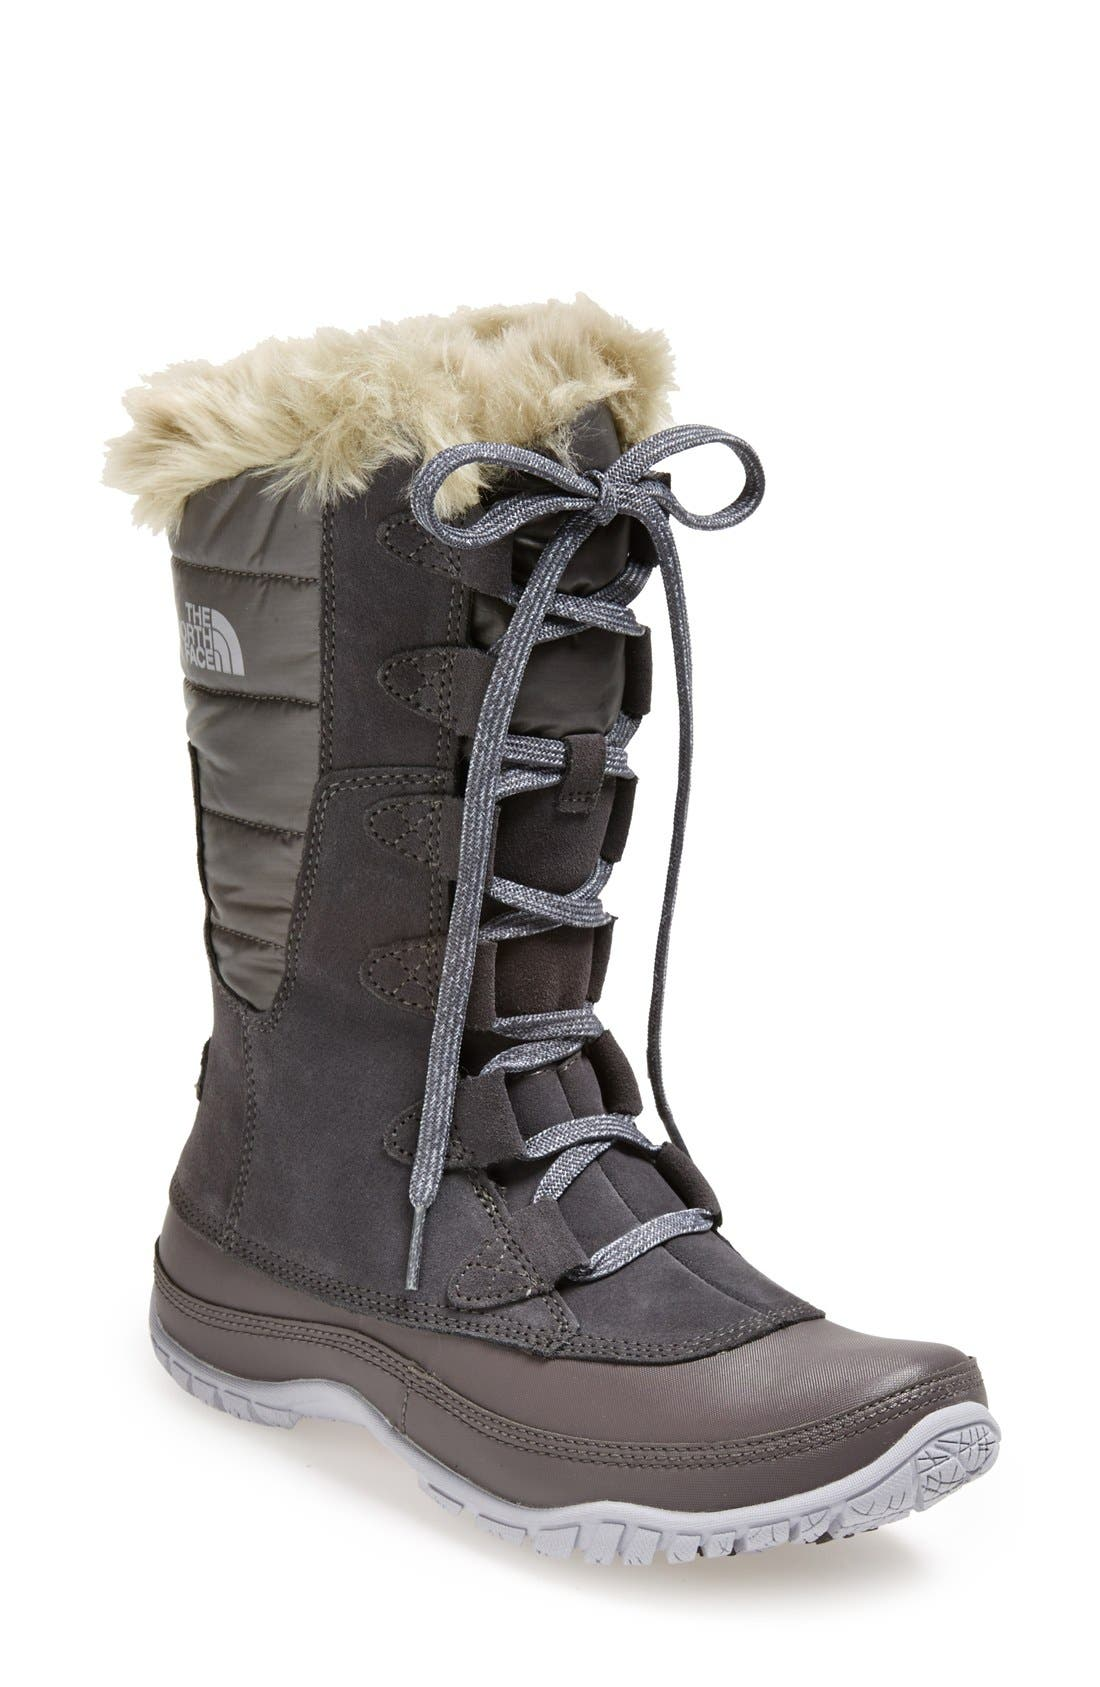 Main Image - The North Face 'Nuptse Purna' Waterproof PrimaLoft® Eco Insulated Winter Boot (Women)